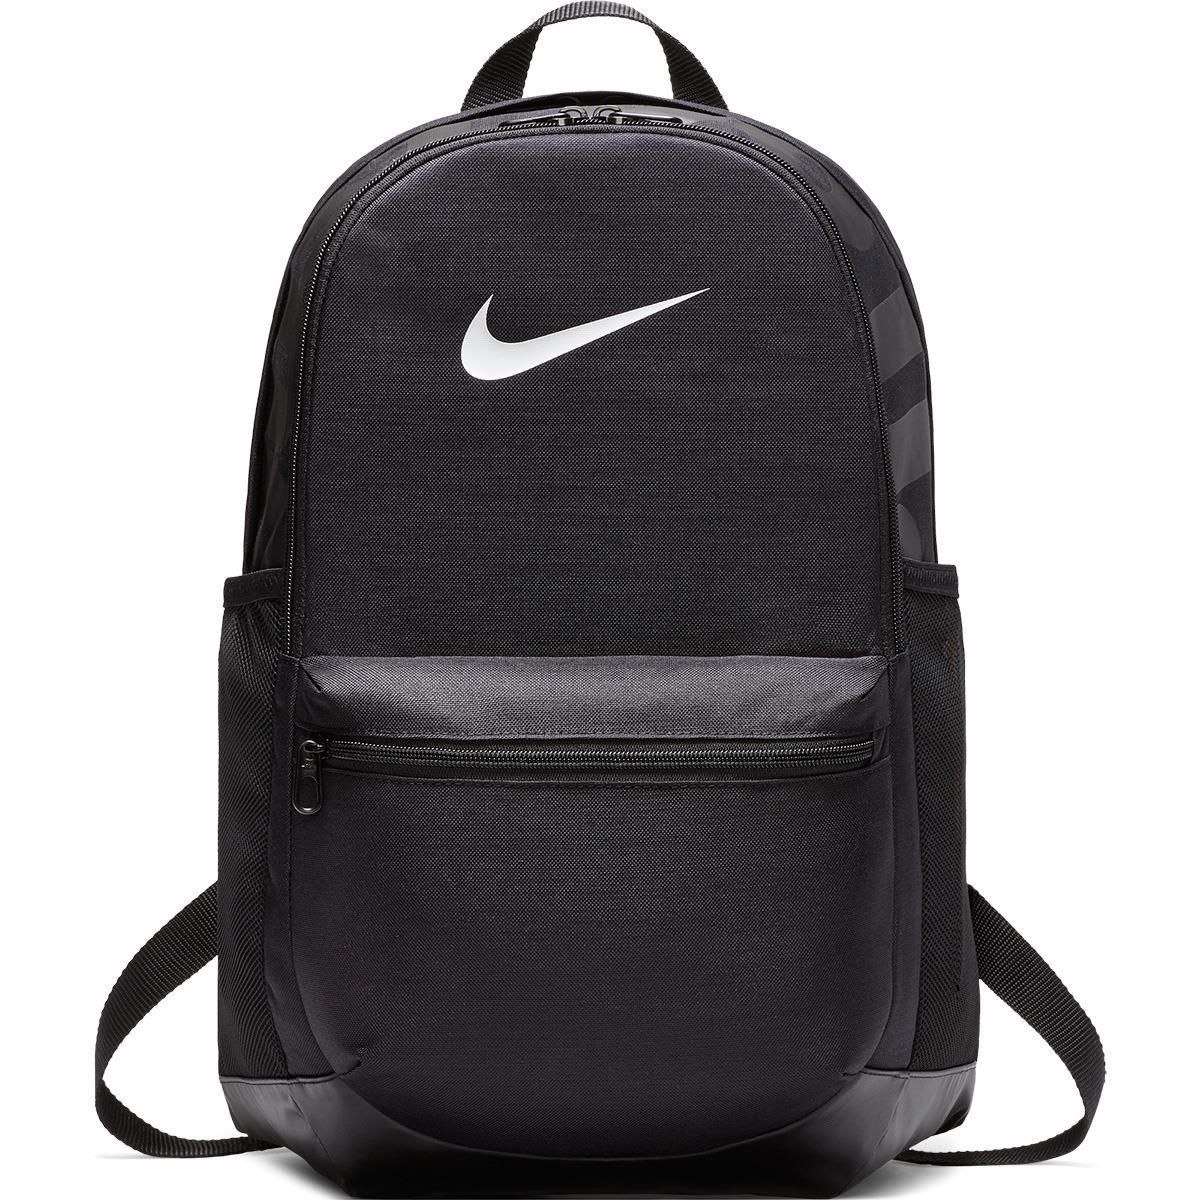 3cb018818 Mochila Nike Brasilia Media + Nf - R$ 139,90 em Mercado Livre